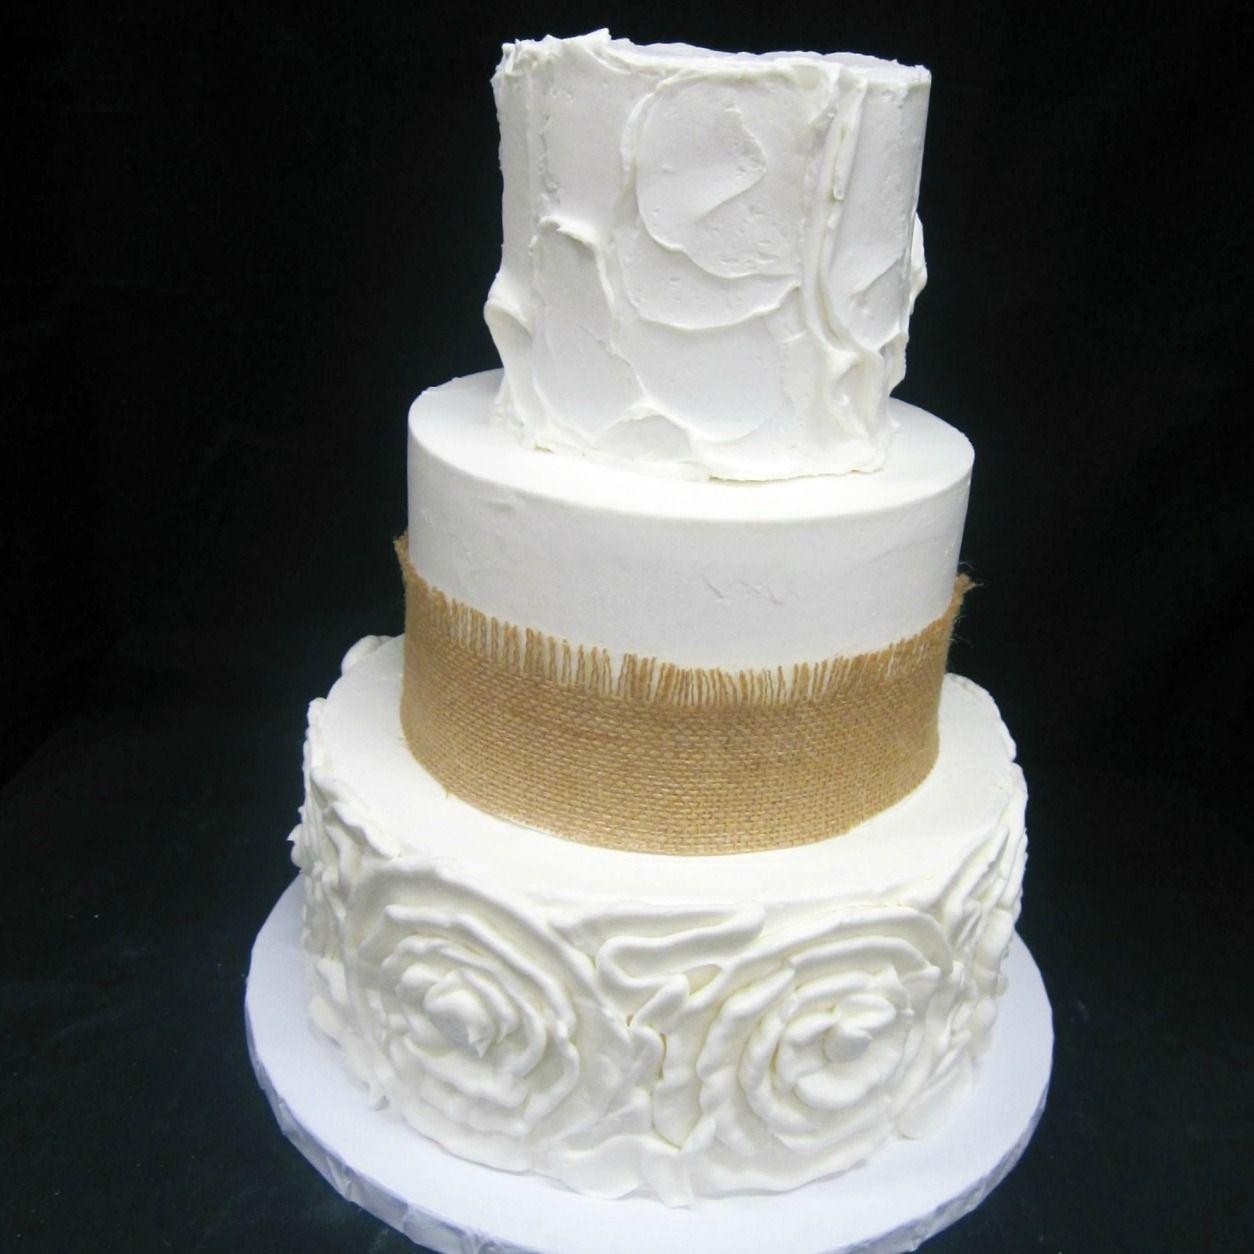 Rose burlap spackle wedding cake from Cake Crumbs Bakery in